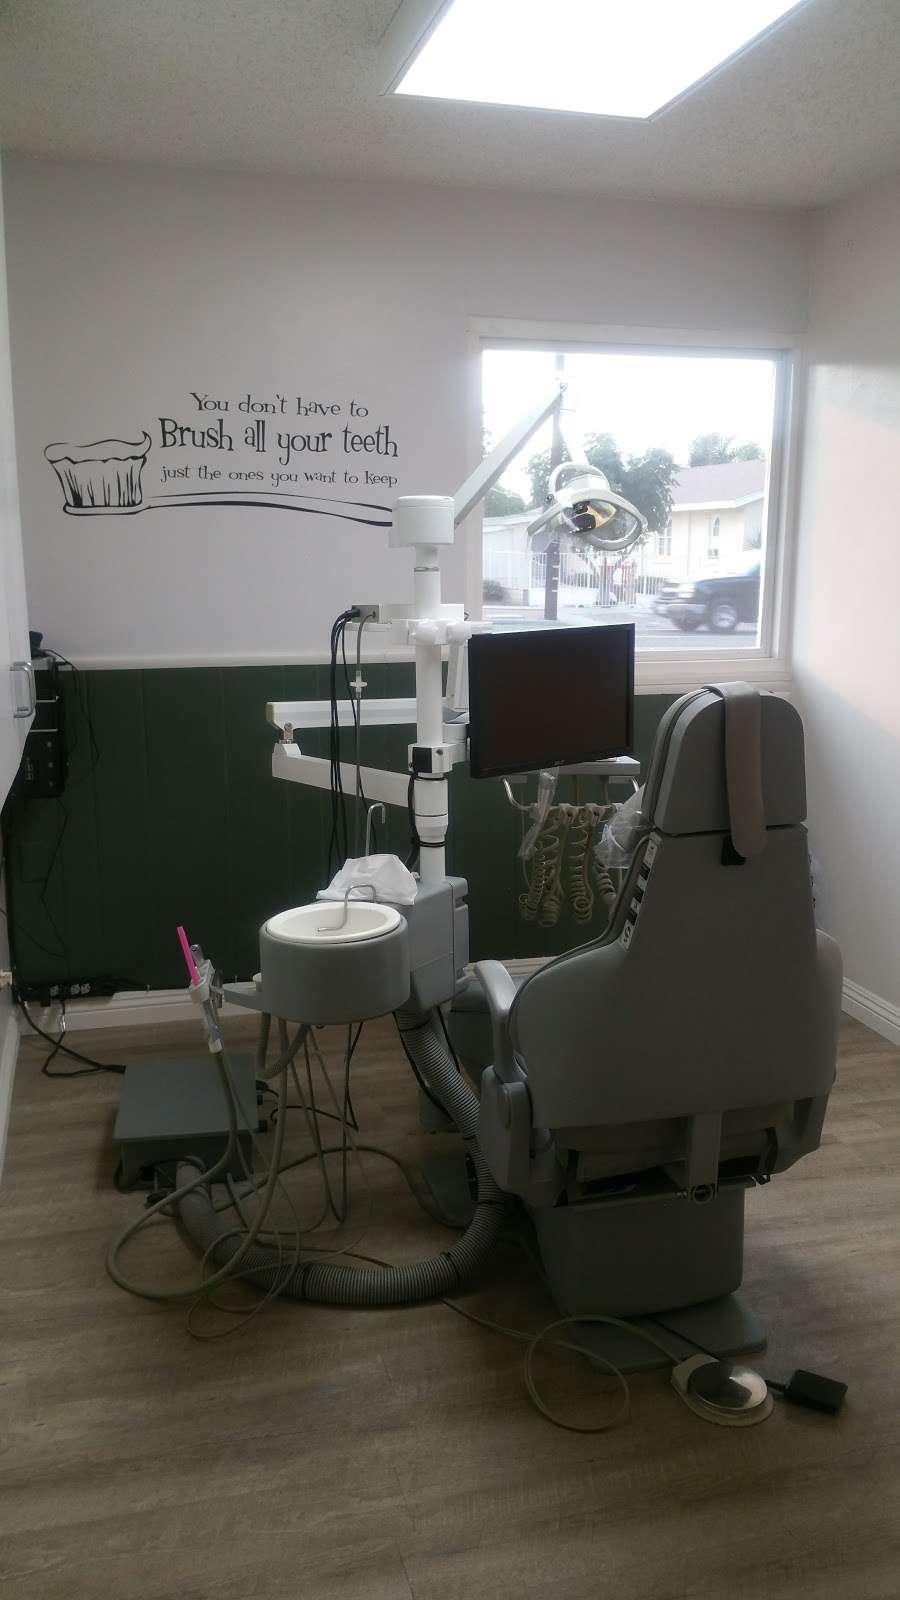 Kilzi Dental Corporation - dentist    Photo 5 of 9   Address: 1113 S Main St B, Corona, CA 92882, USA   Phone: (951) 739-0752